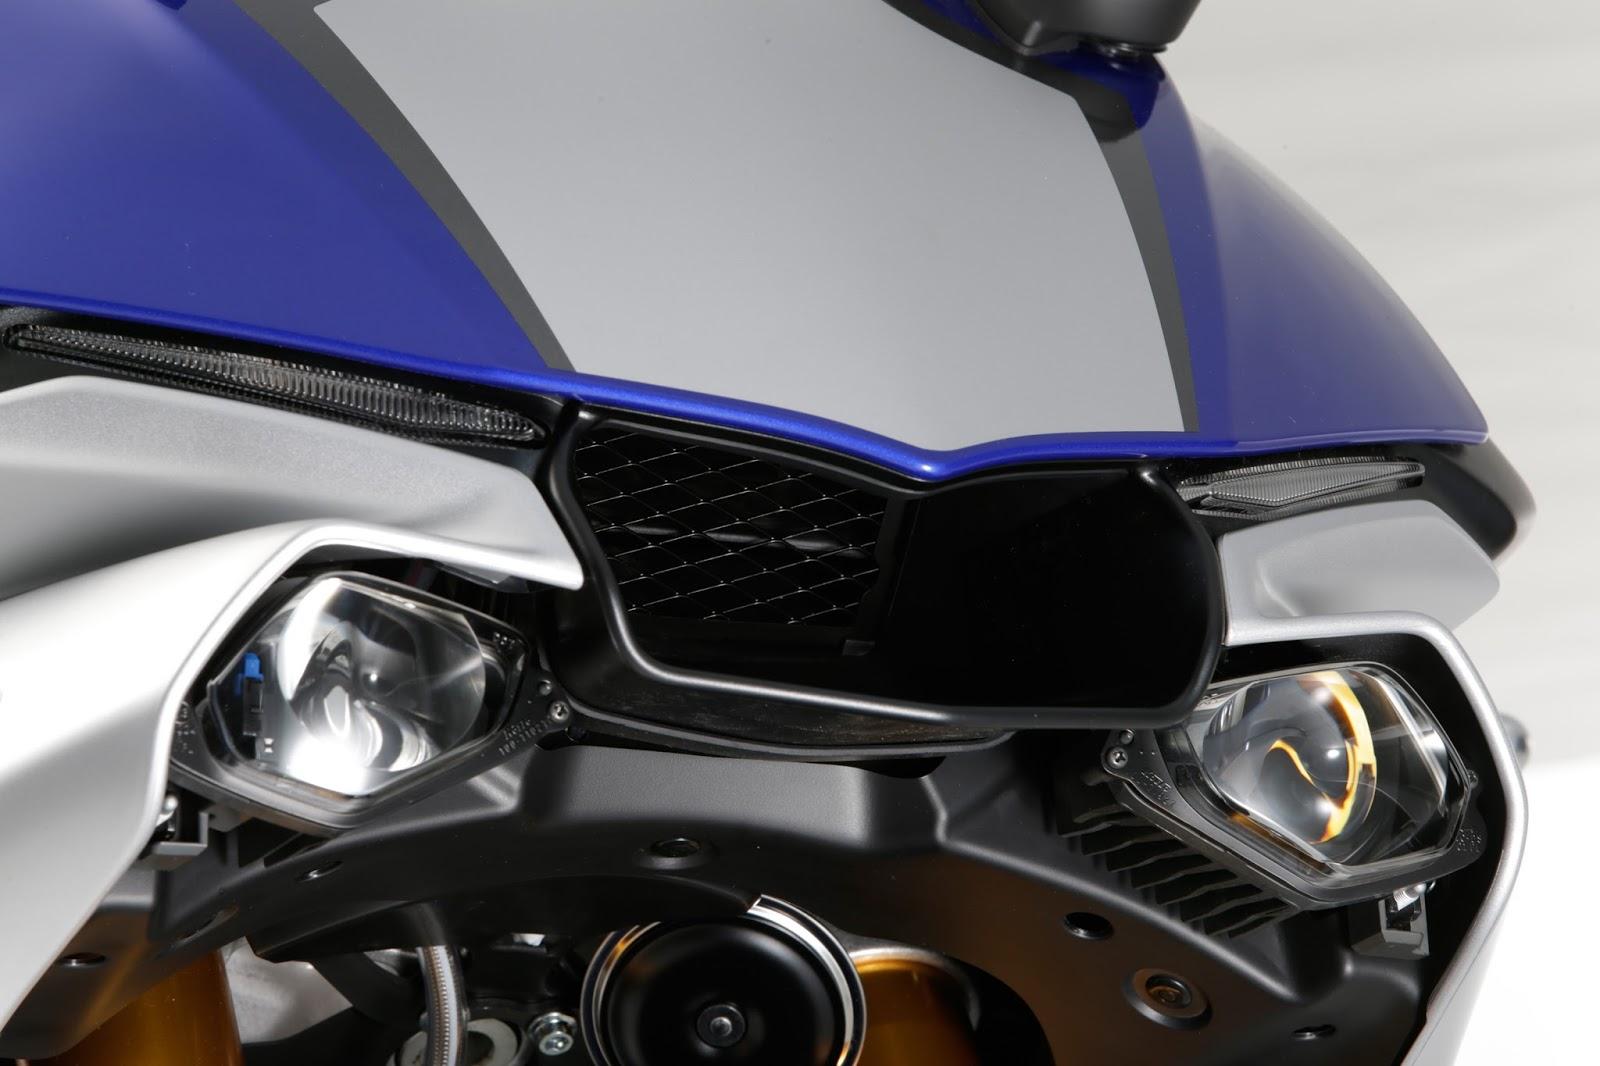 2016 Yamaha YZF R1 R1M Front Headlight Image